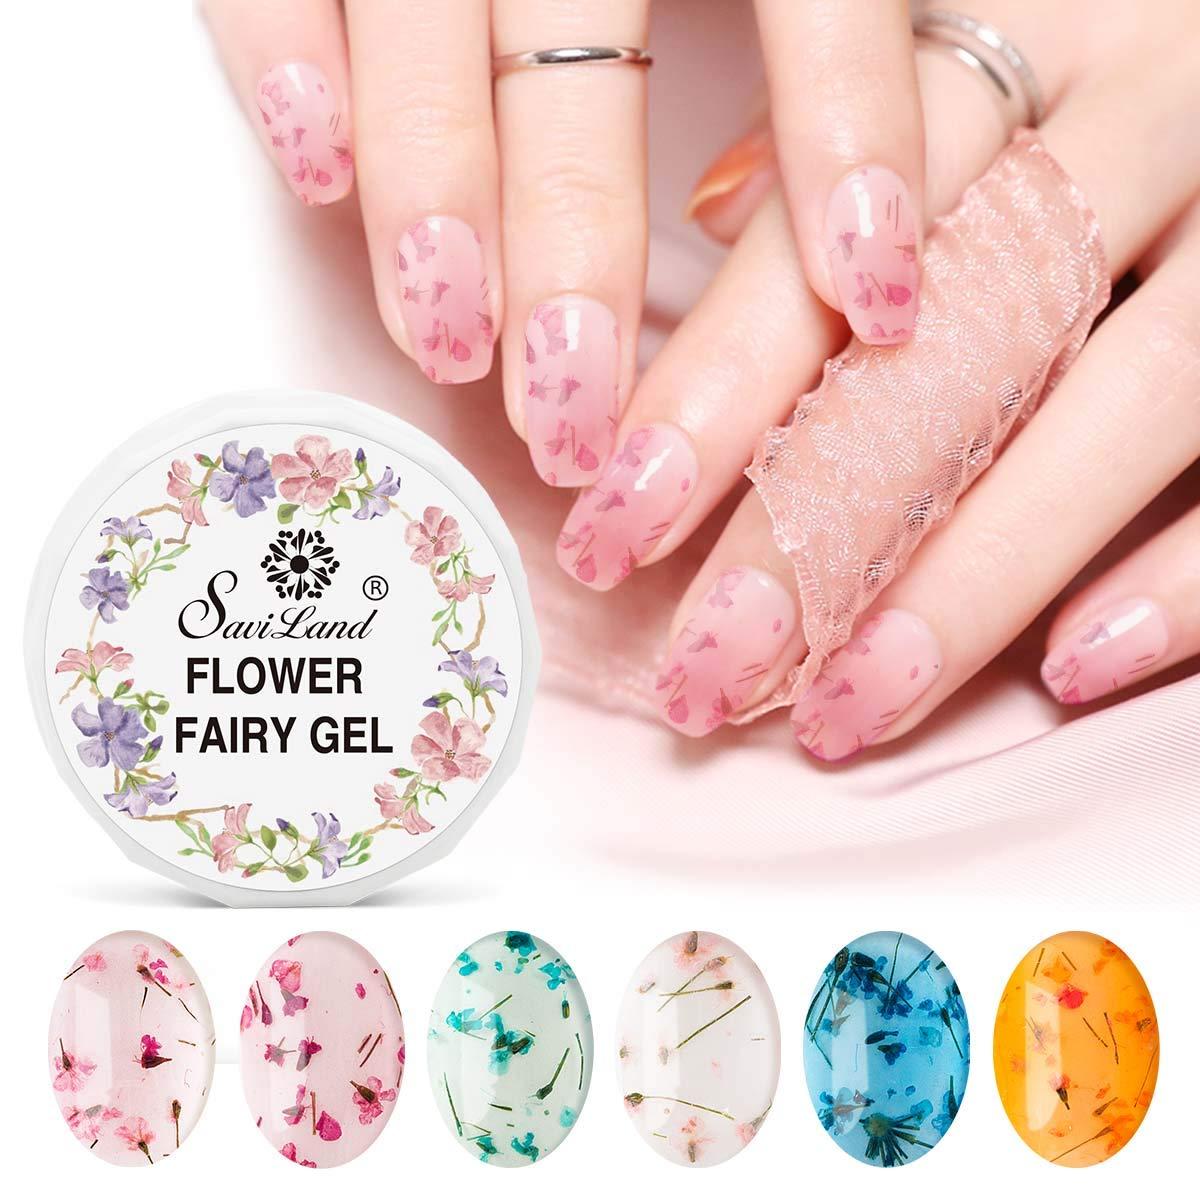 Dried Flower Gel Nail Polish, Saviland 6 Colors Soak Off UV LED Nail Varnish Decoration Manicure Nail Art Design Kit (Pink Green Yellow)